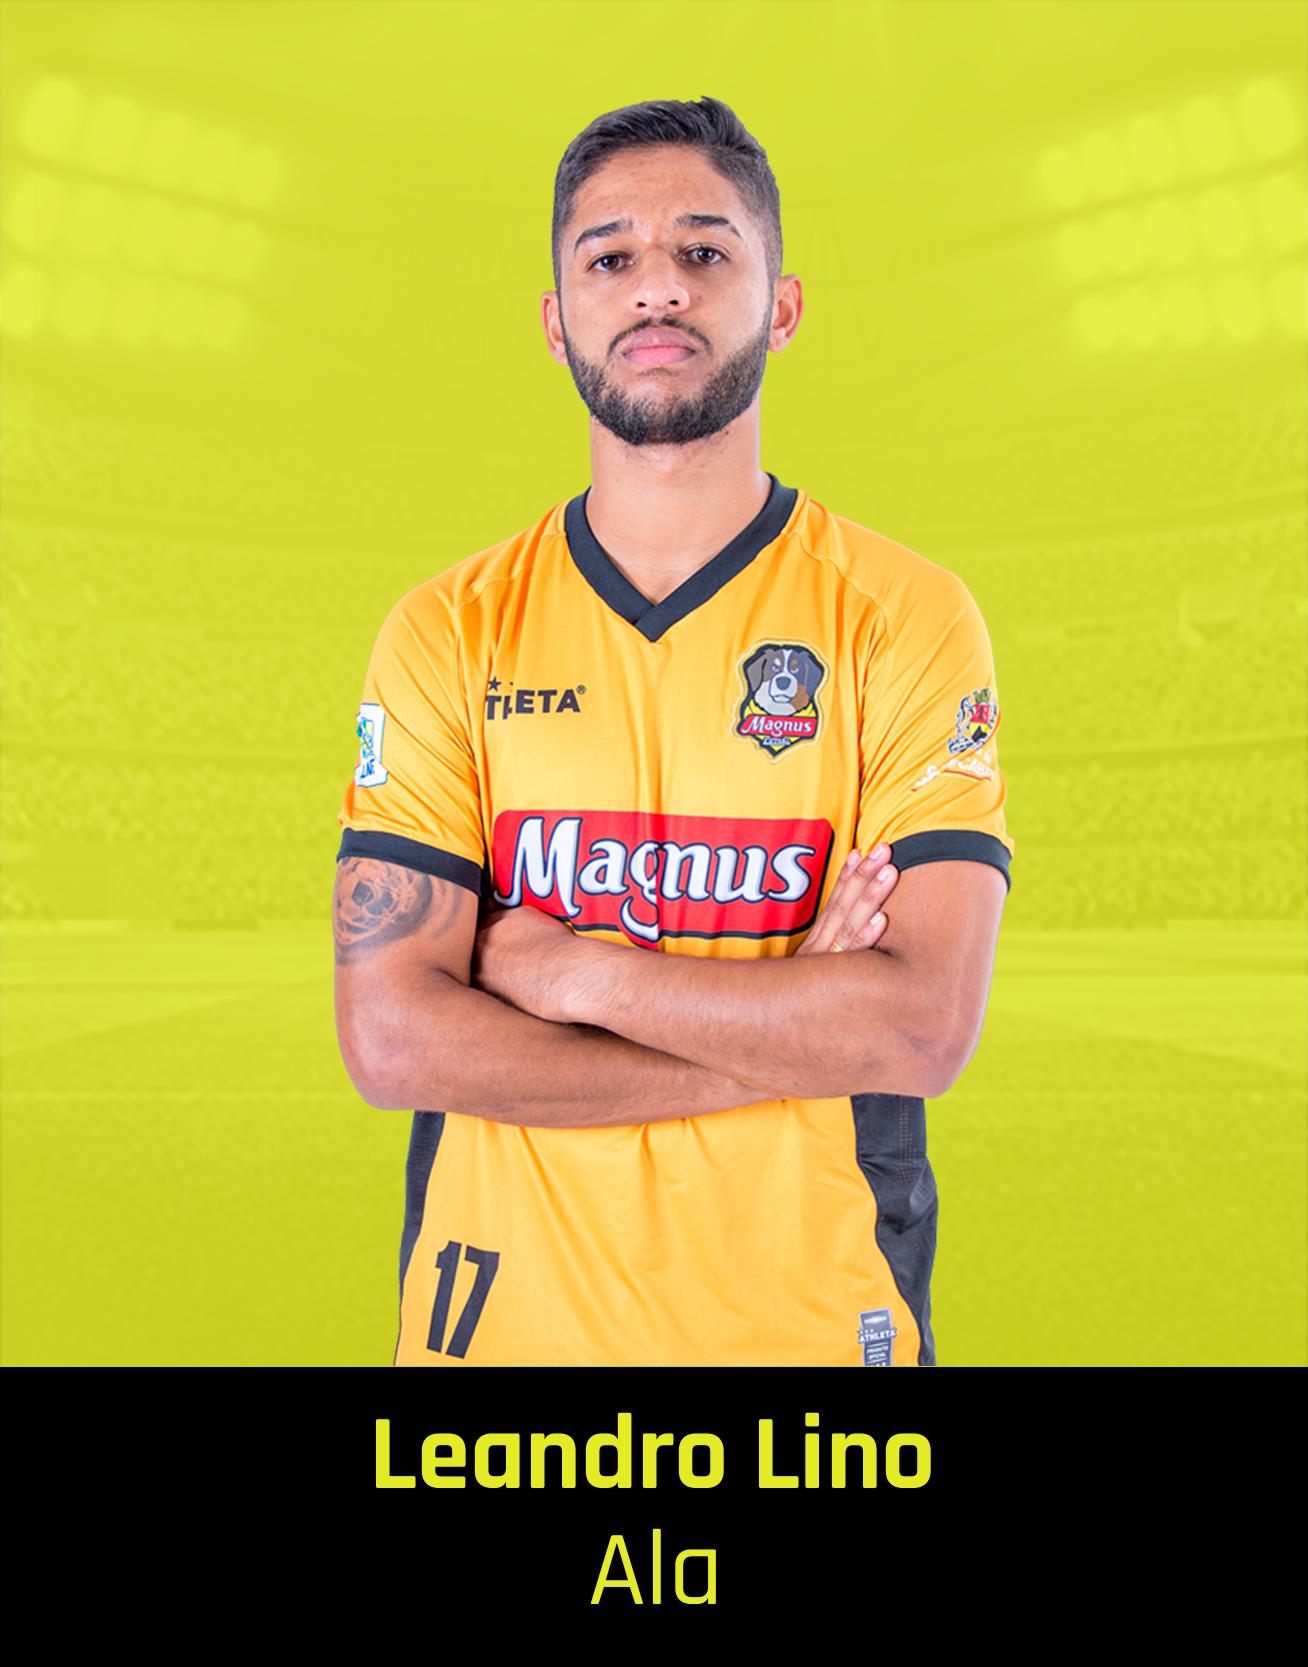 Leandro Lino